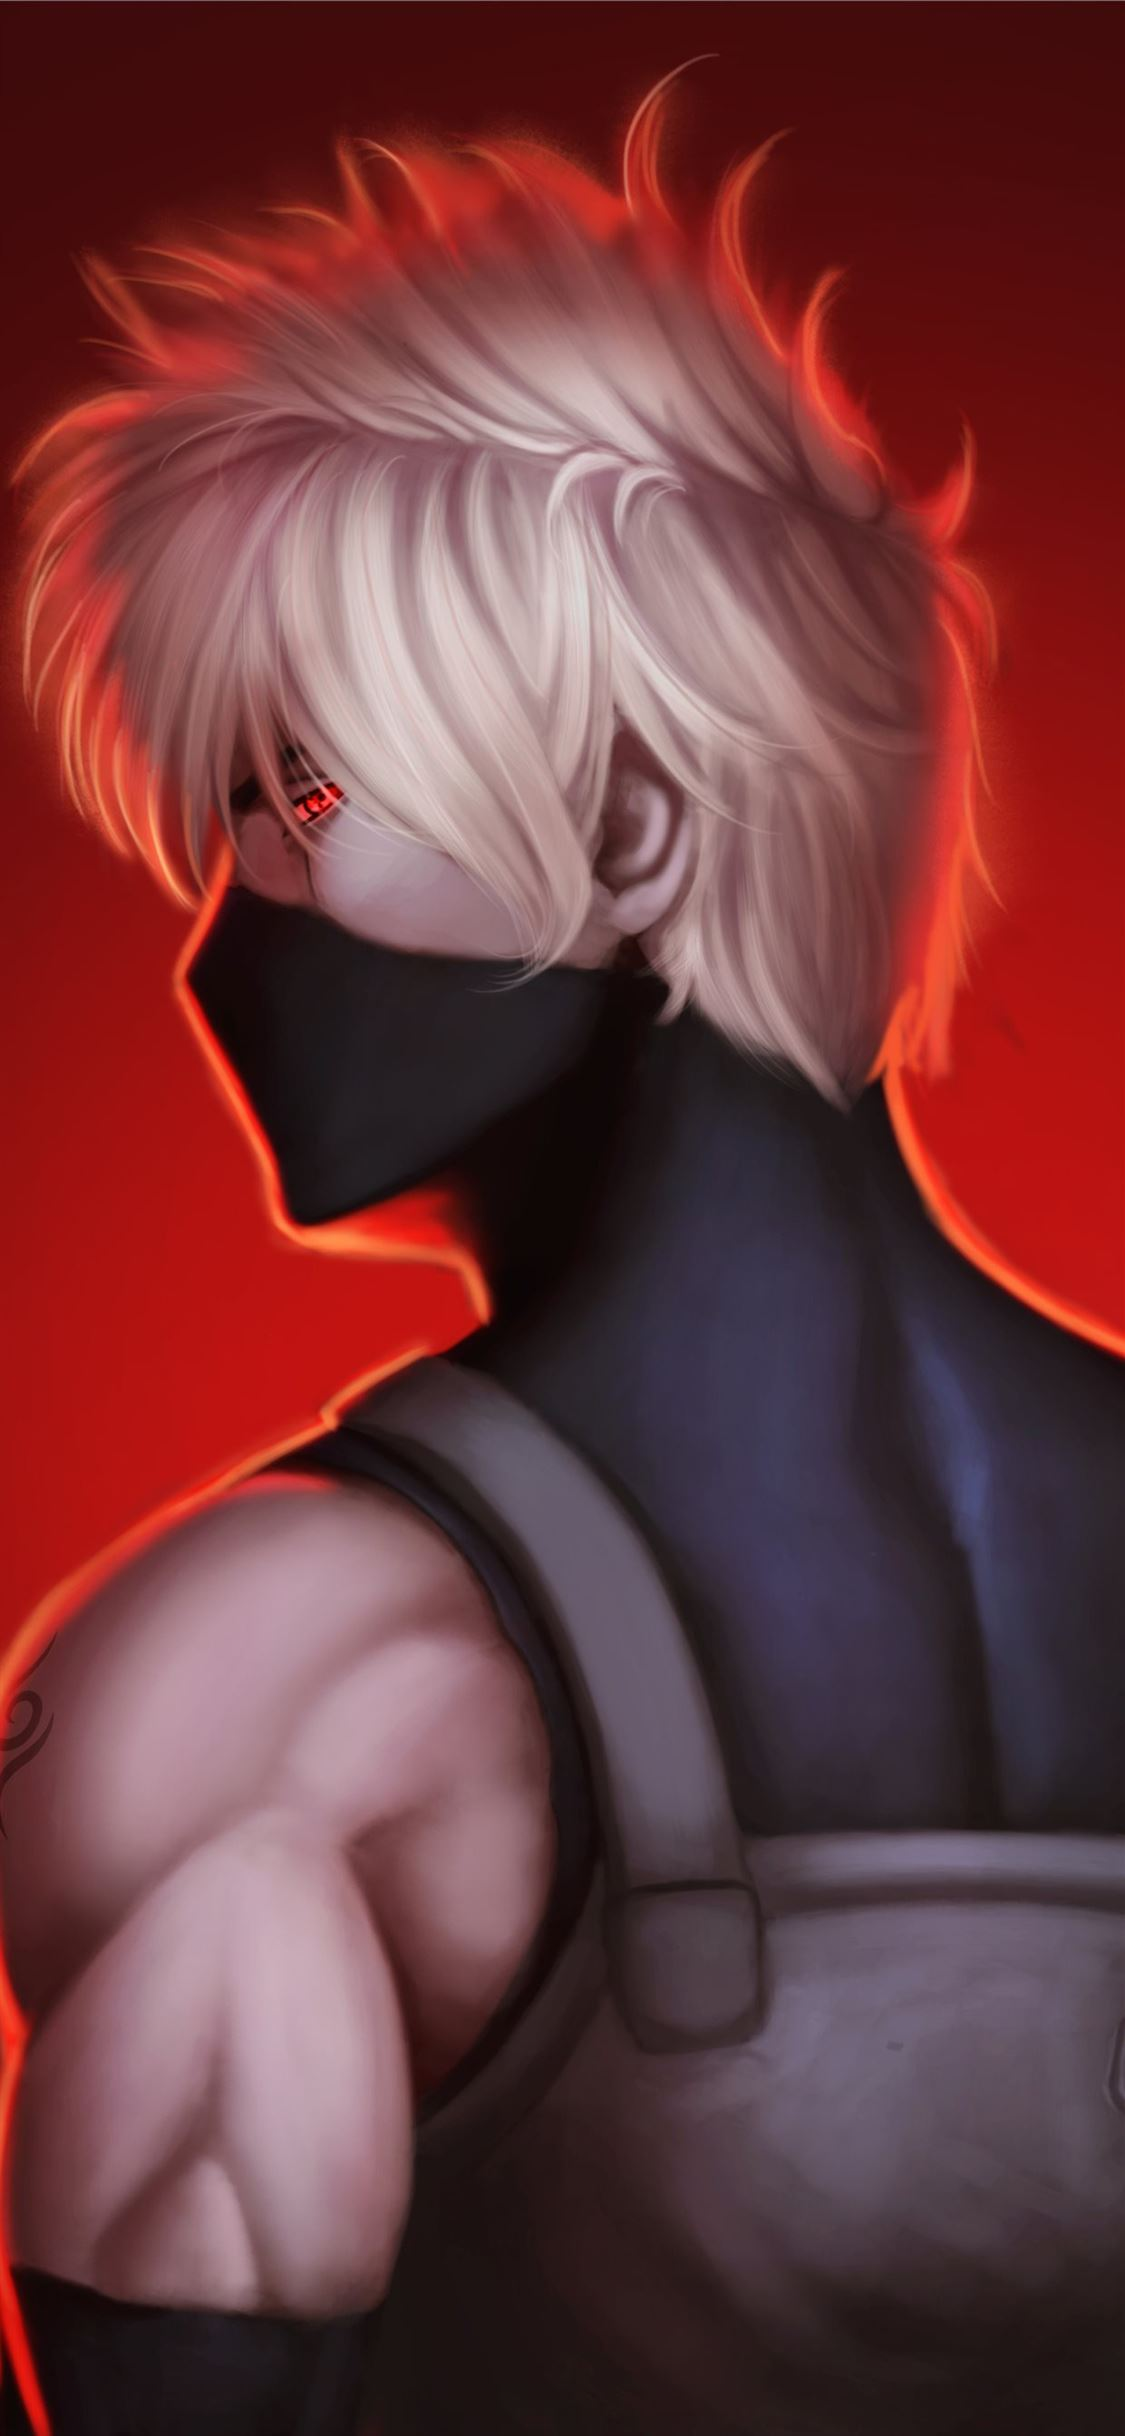 Anime Ninja Art Sony Xperia X Xz Z5 Premium Hd 4k Iphone X Wallpapers Free Download